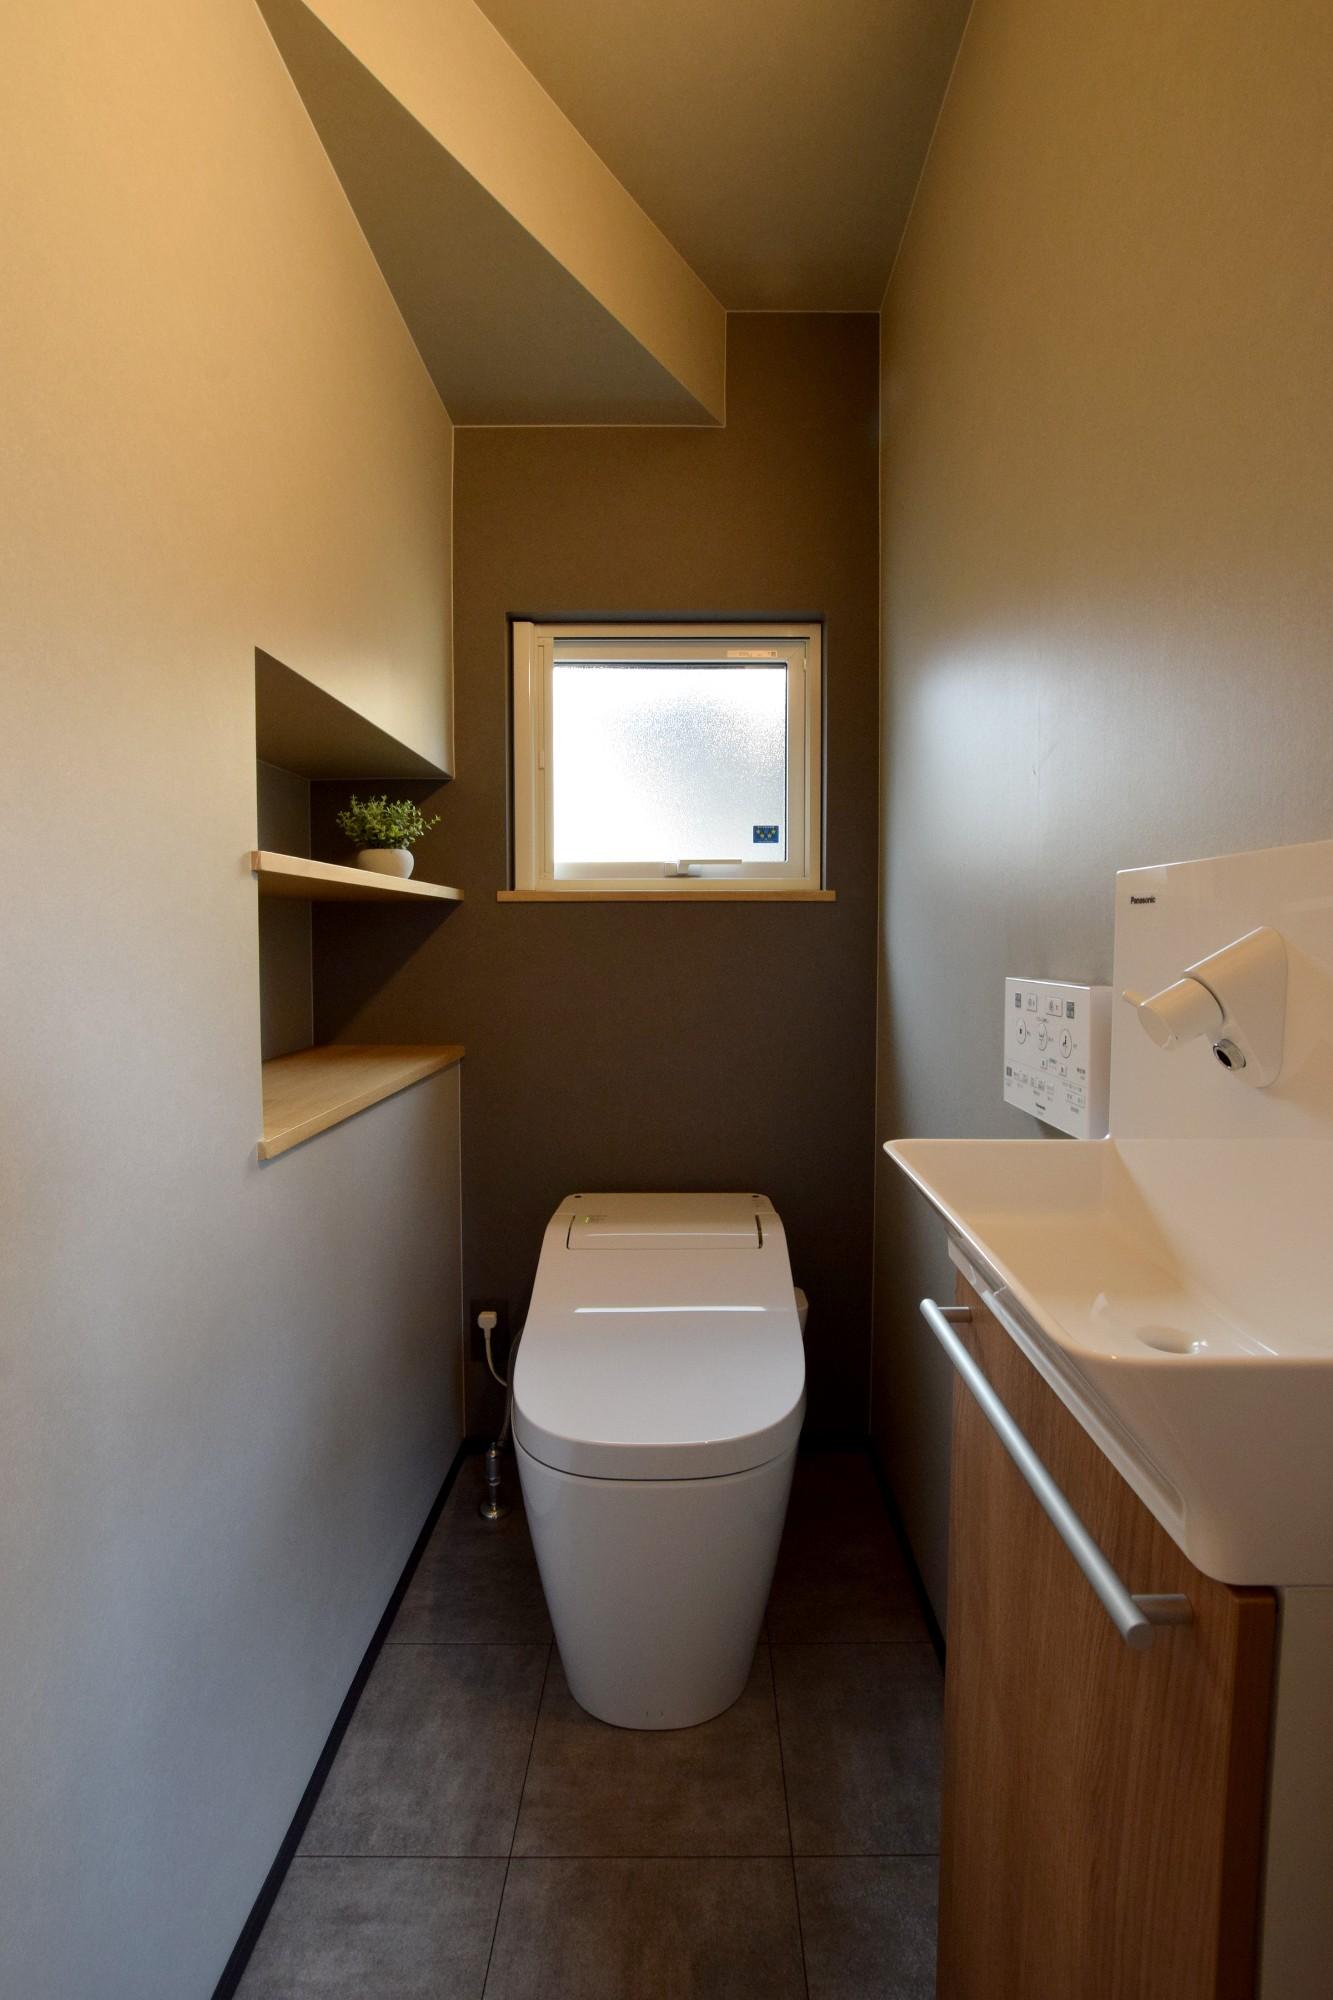 DETAIL HOME(ディテールホーム)「オークを基調としたナチュラルモダンな家」のシンプル・ナチュラルなトイレの実例写真